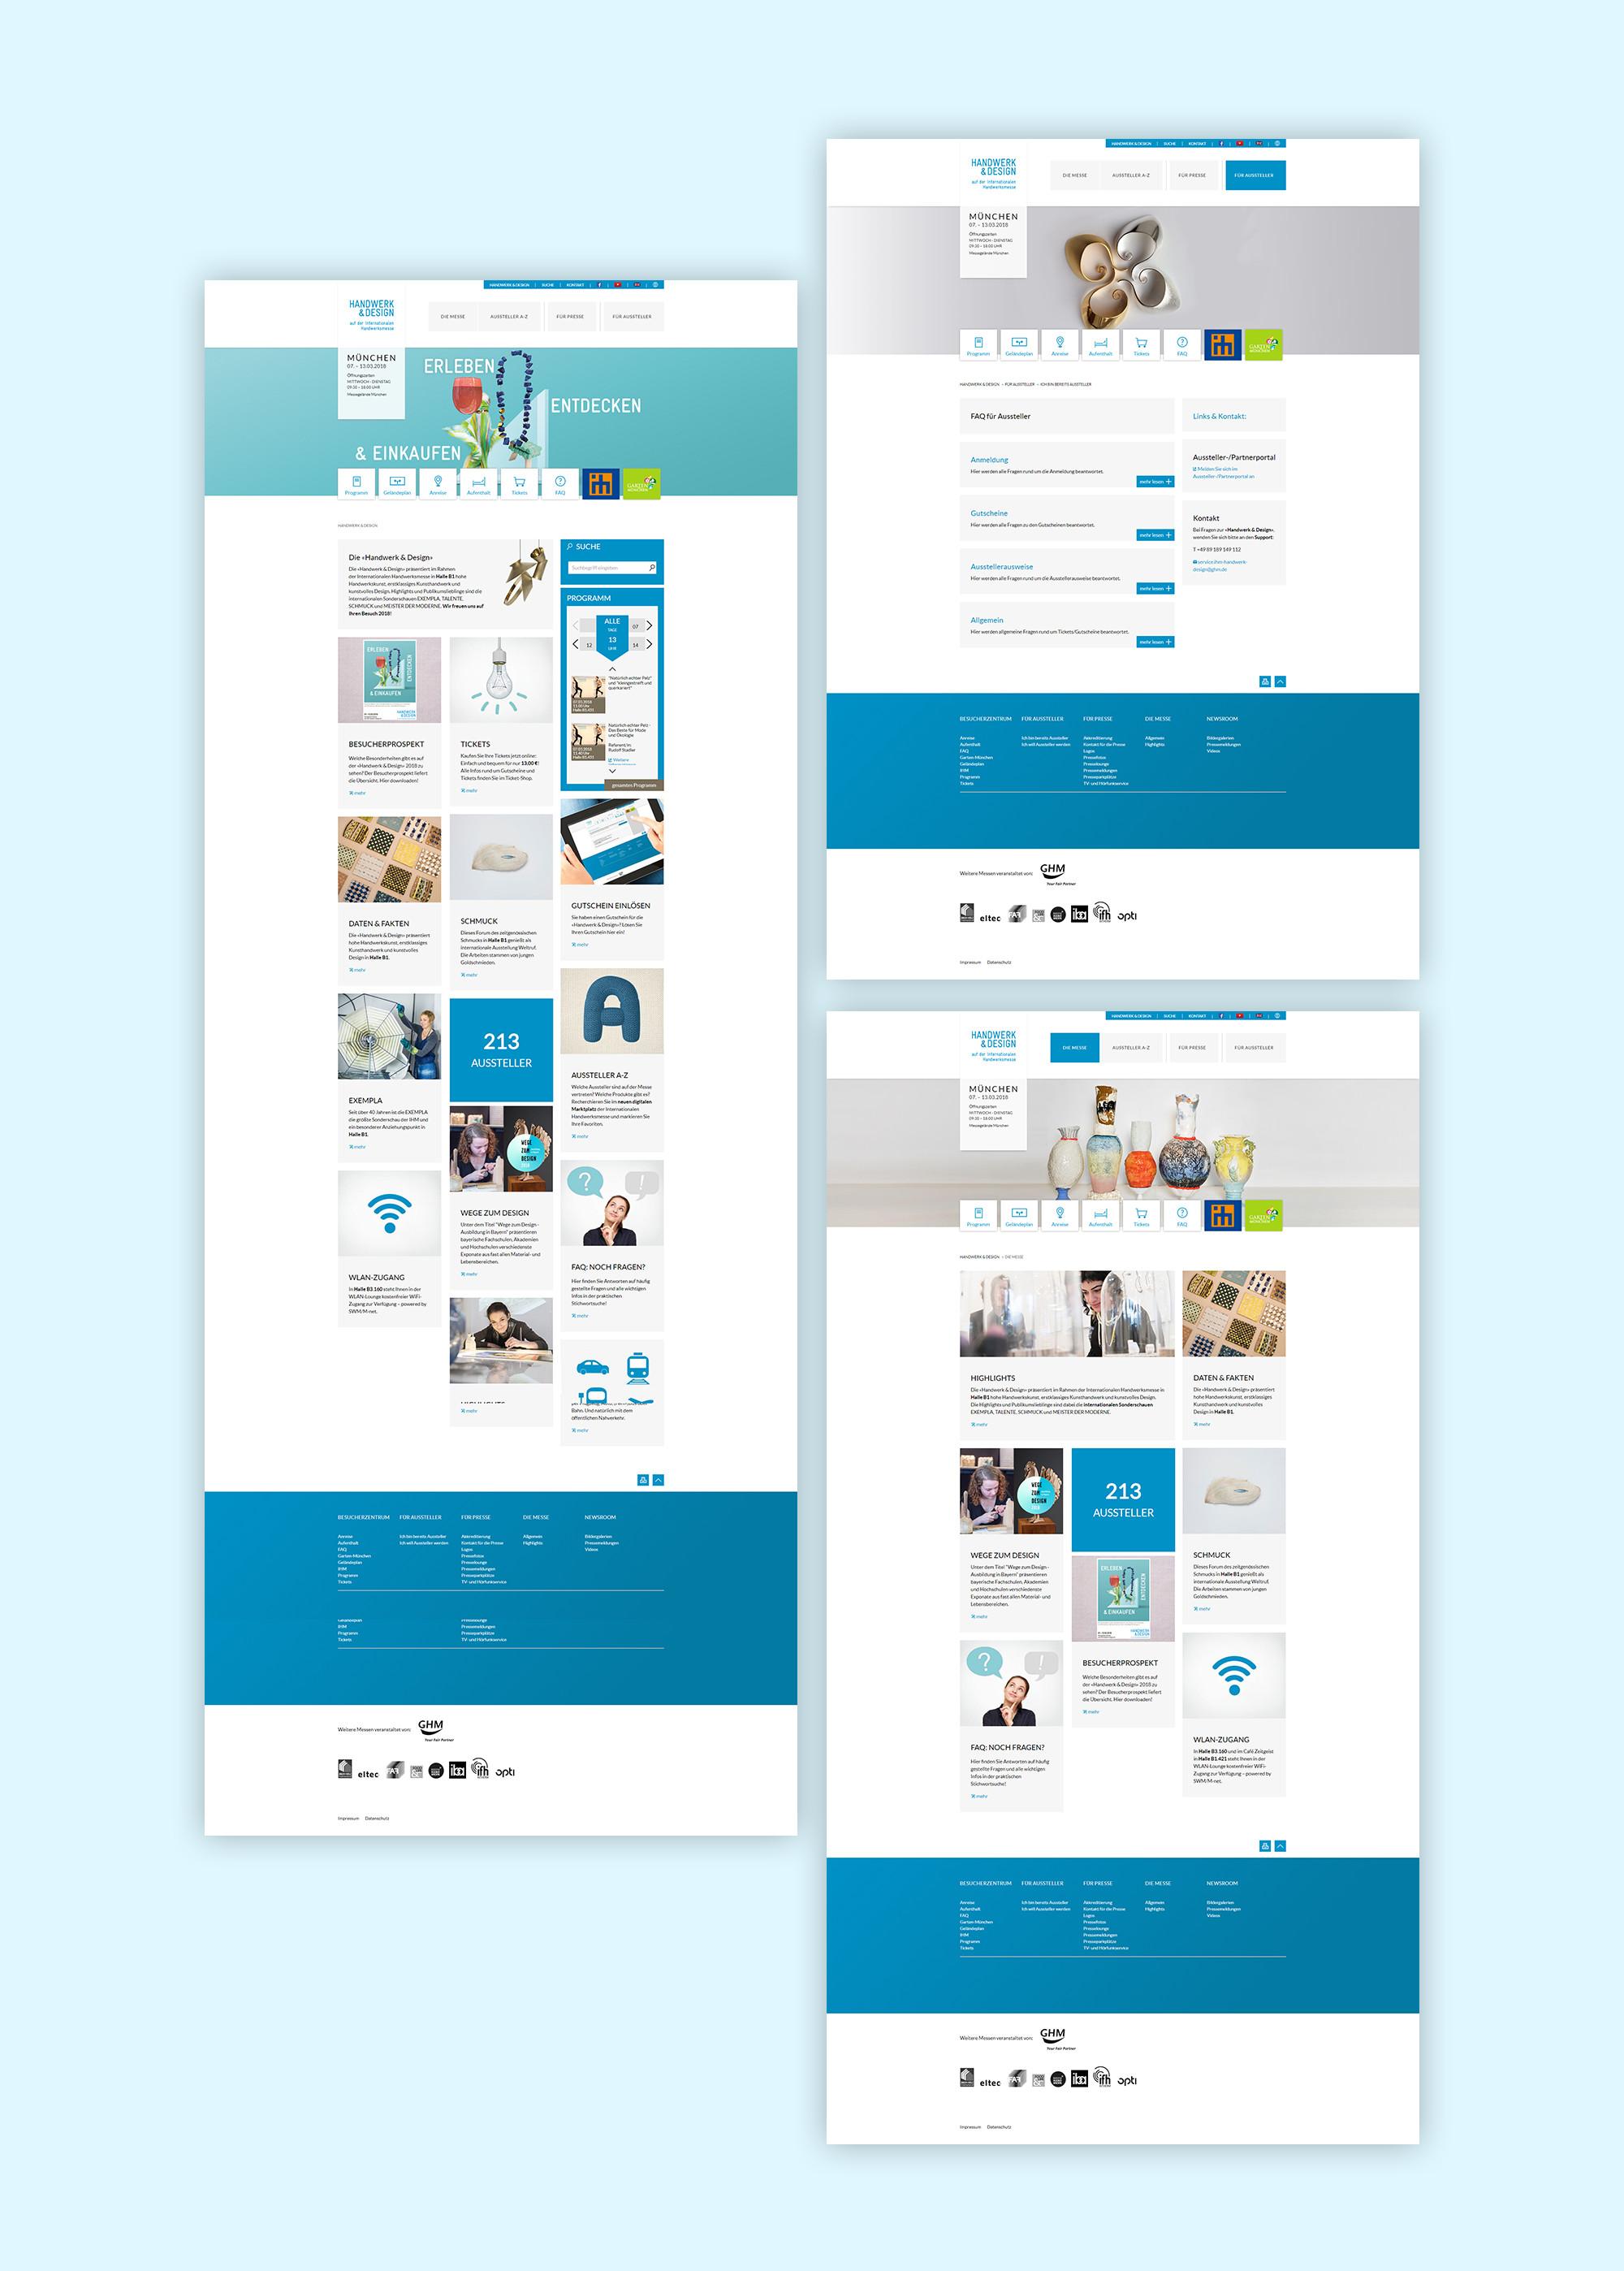 Handwerk Design  Handwerk & Design hyperdigital